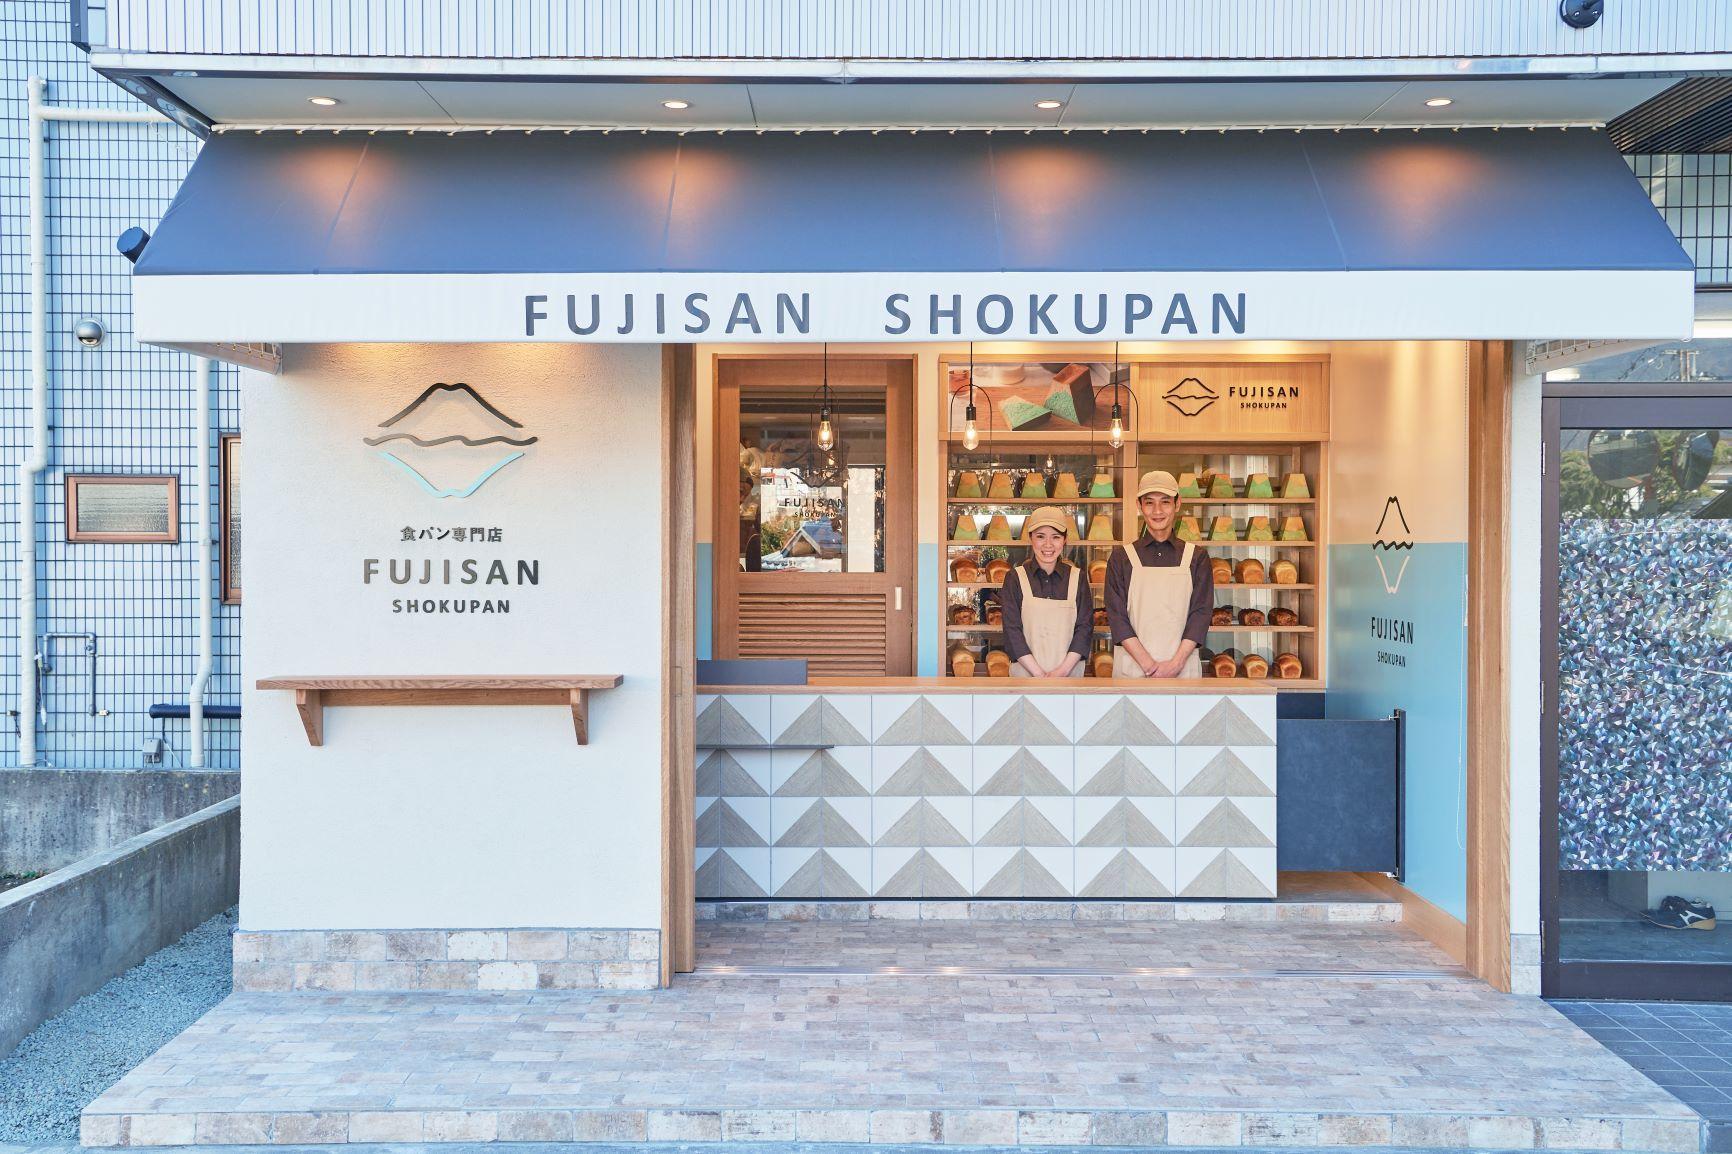 fujisan-shokupan-mount-fuji-bread-%e5%af%8c%e5%a3%ab%e5%b1%b1%e9%ba%b5%e5%8c%852-2